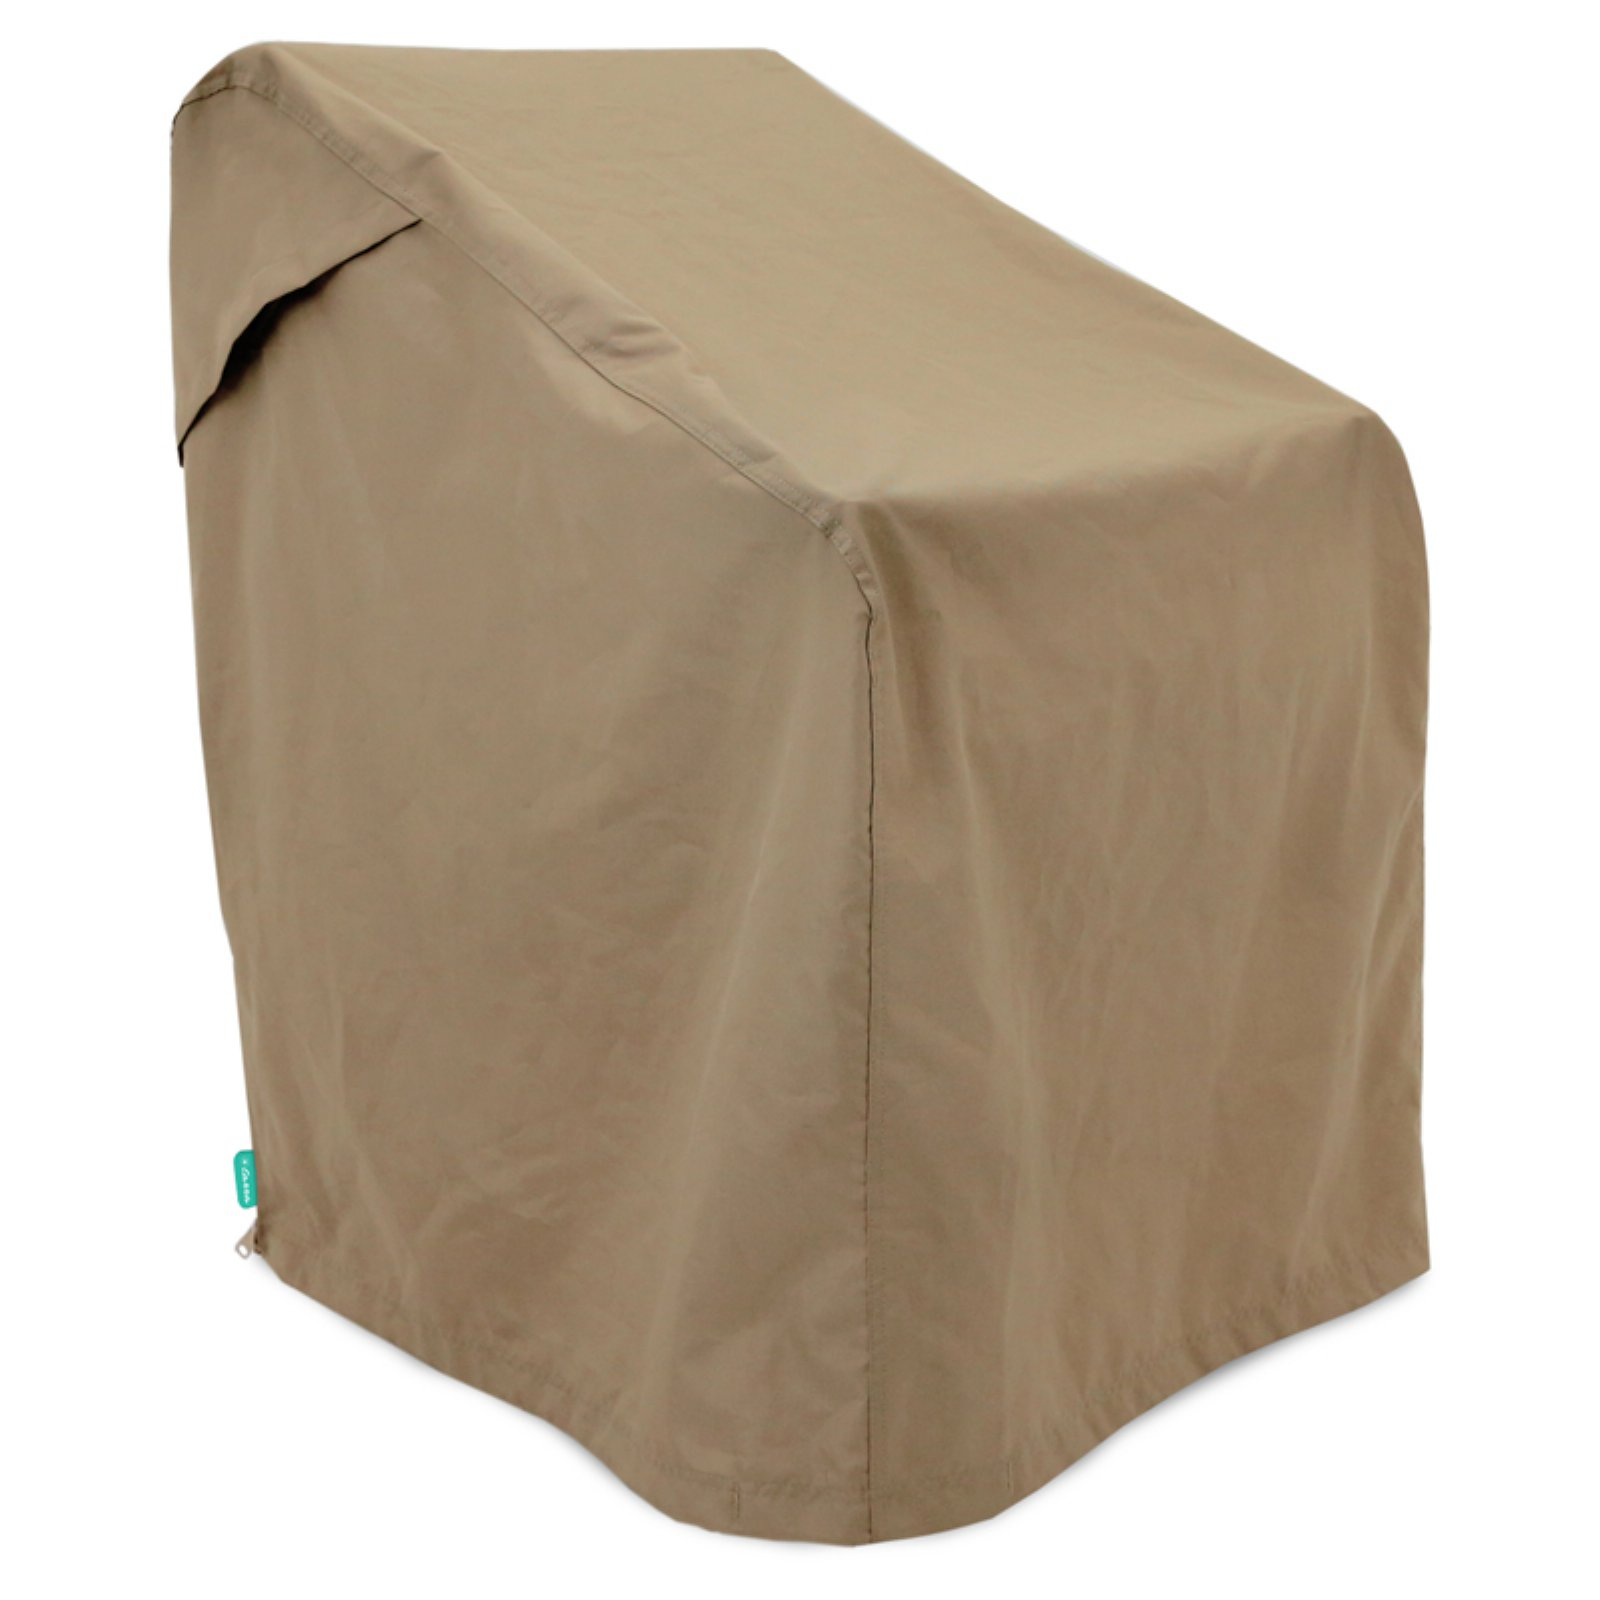 Tarra Home Universal Outdoor UFCCP232636PT Patio Chair Cover